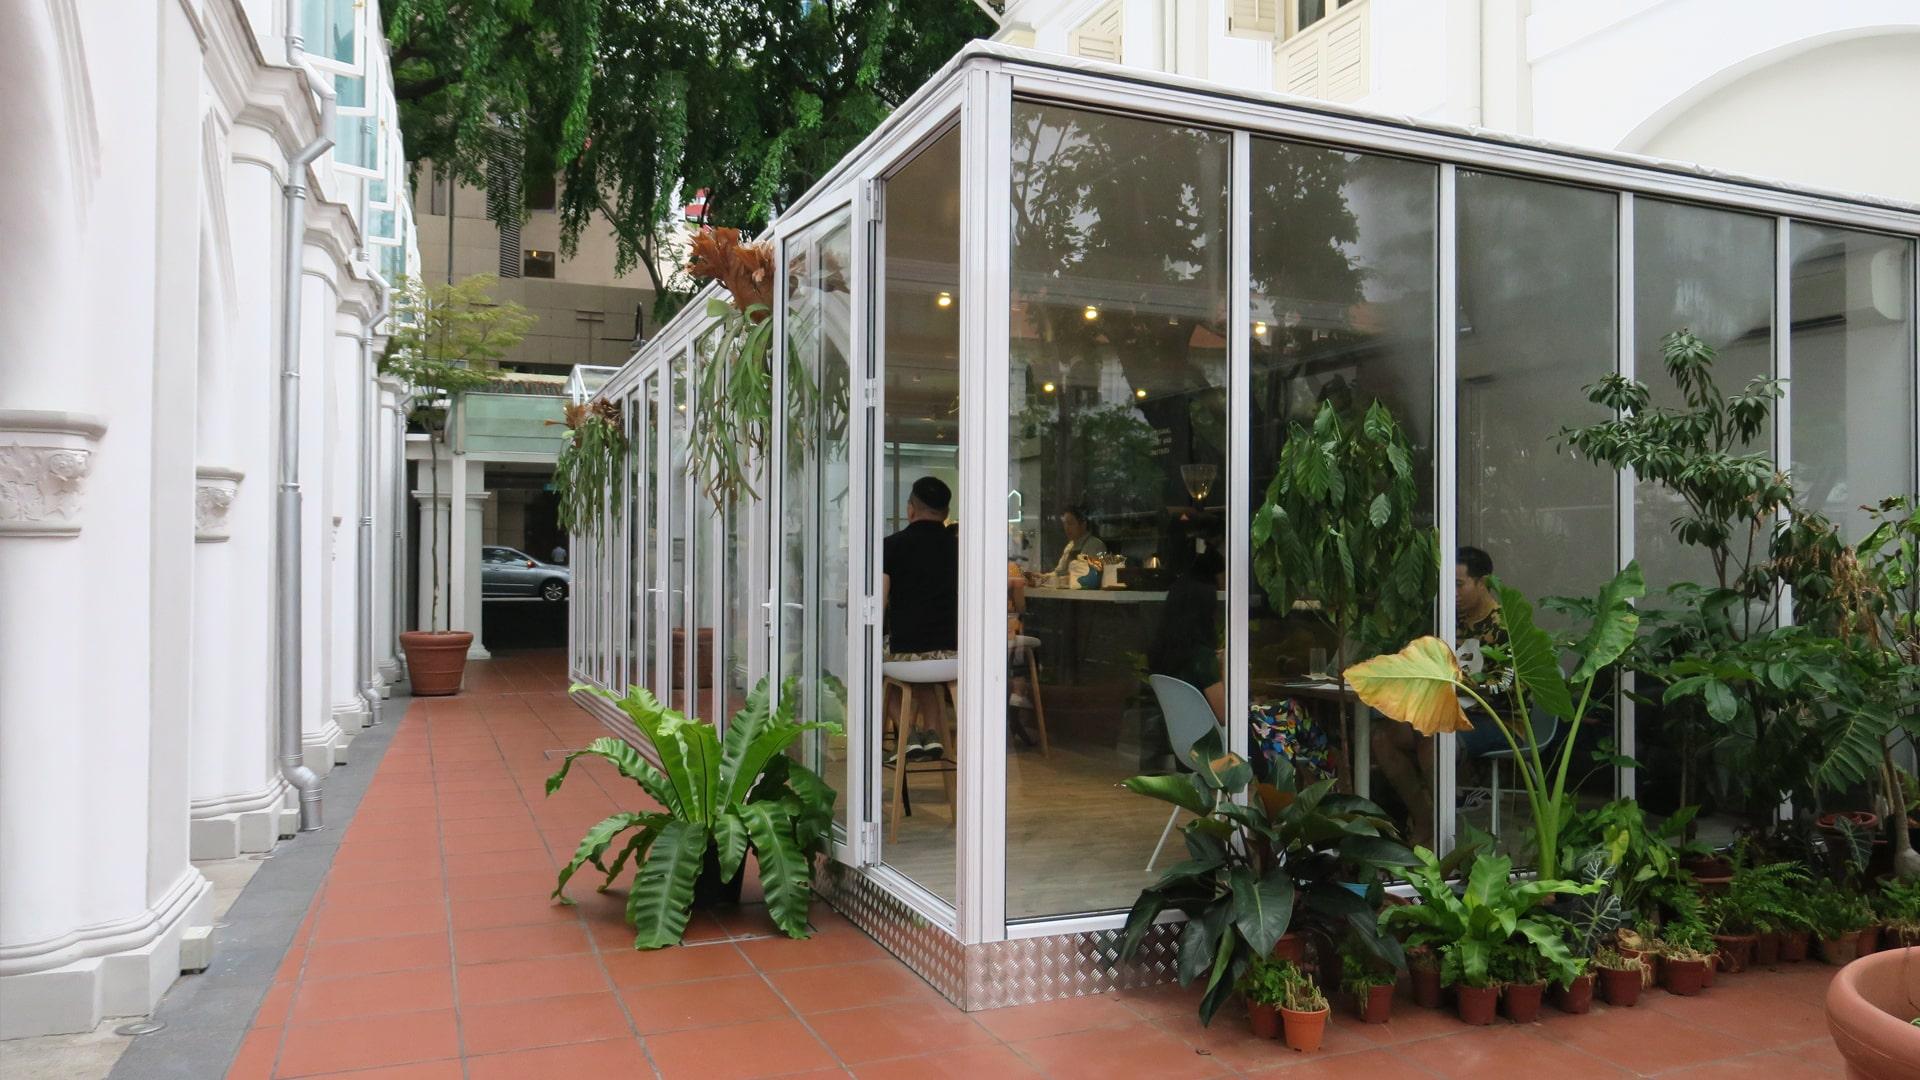 tsc_opt-images_tubelar-system_chijmes-glasshouse-pop-up-cafe-1920x1080-04-min